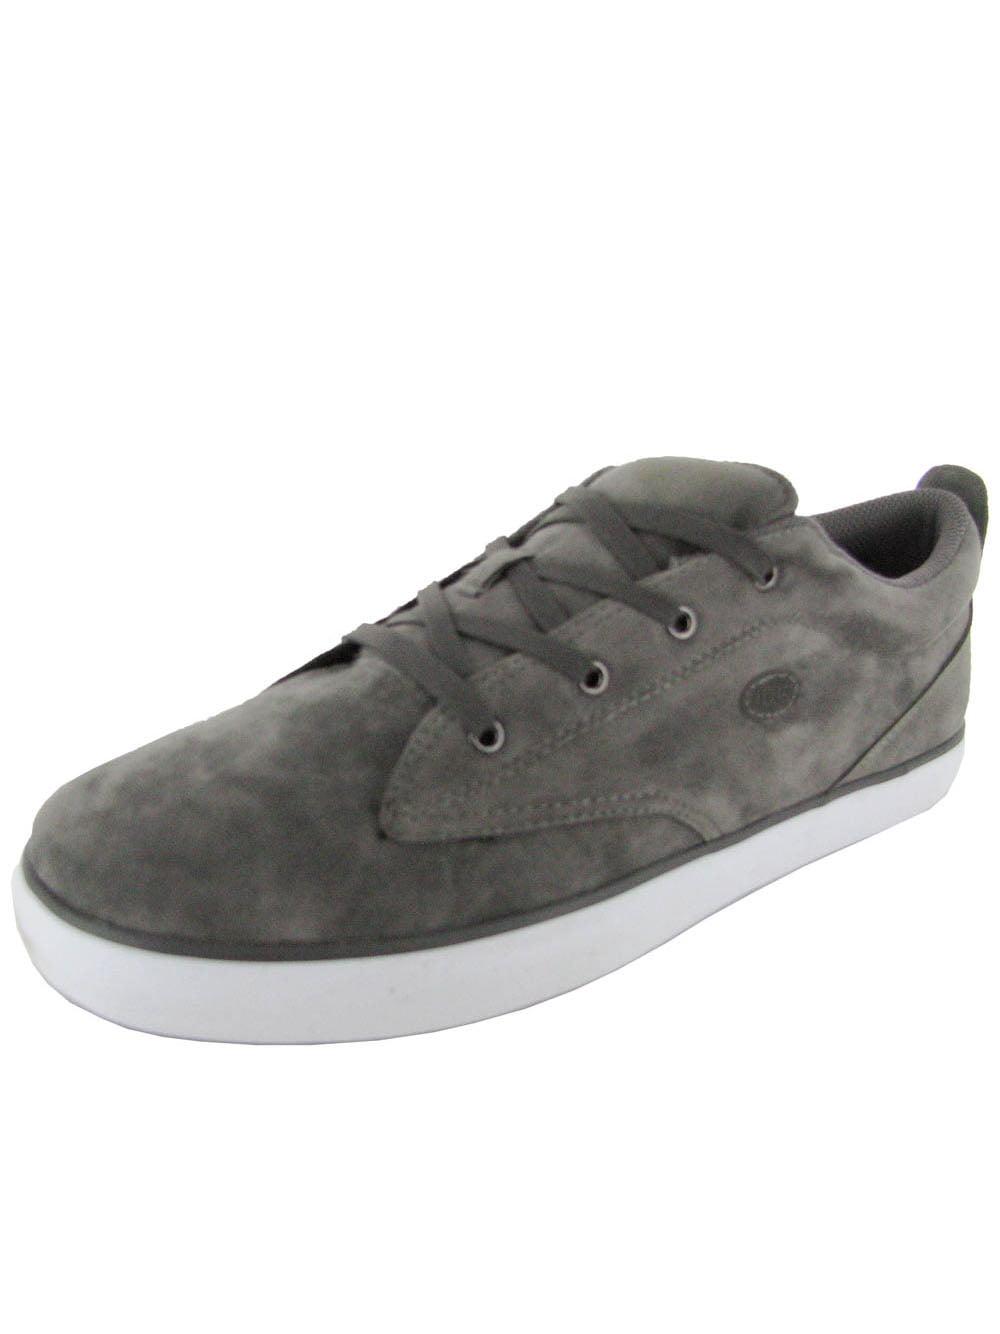 Lugz Men Roller Lo Sneaker Shoe by Lugz